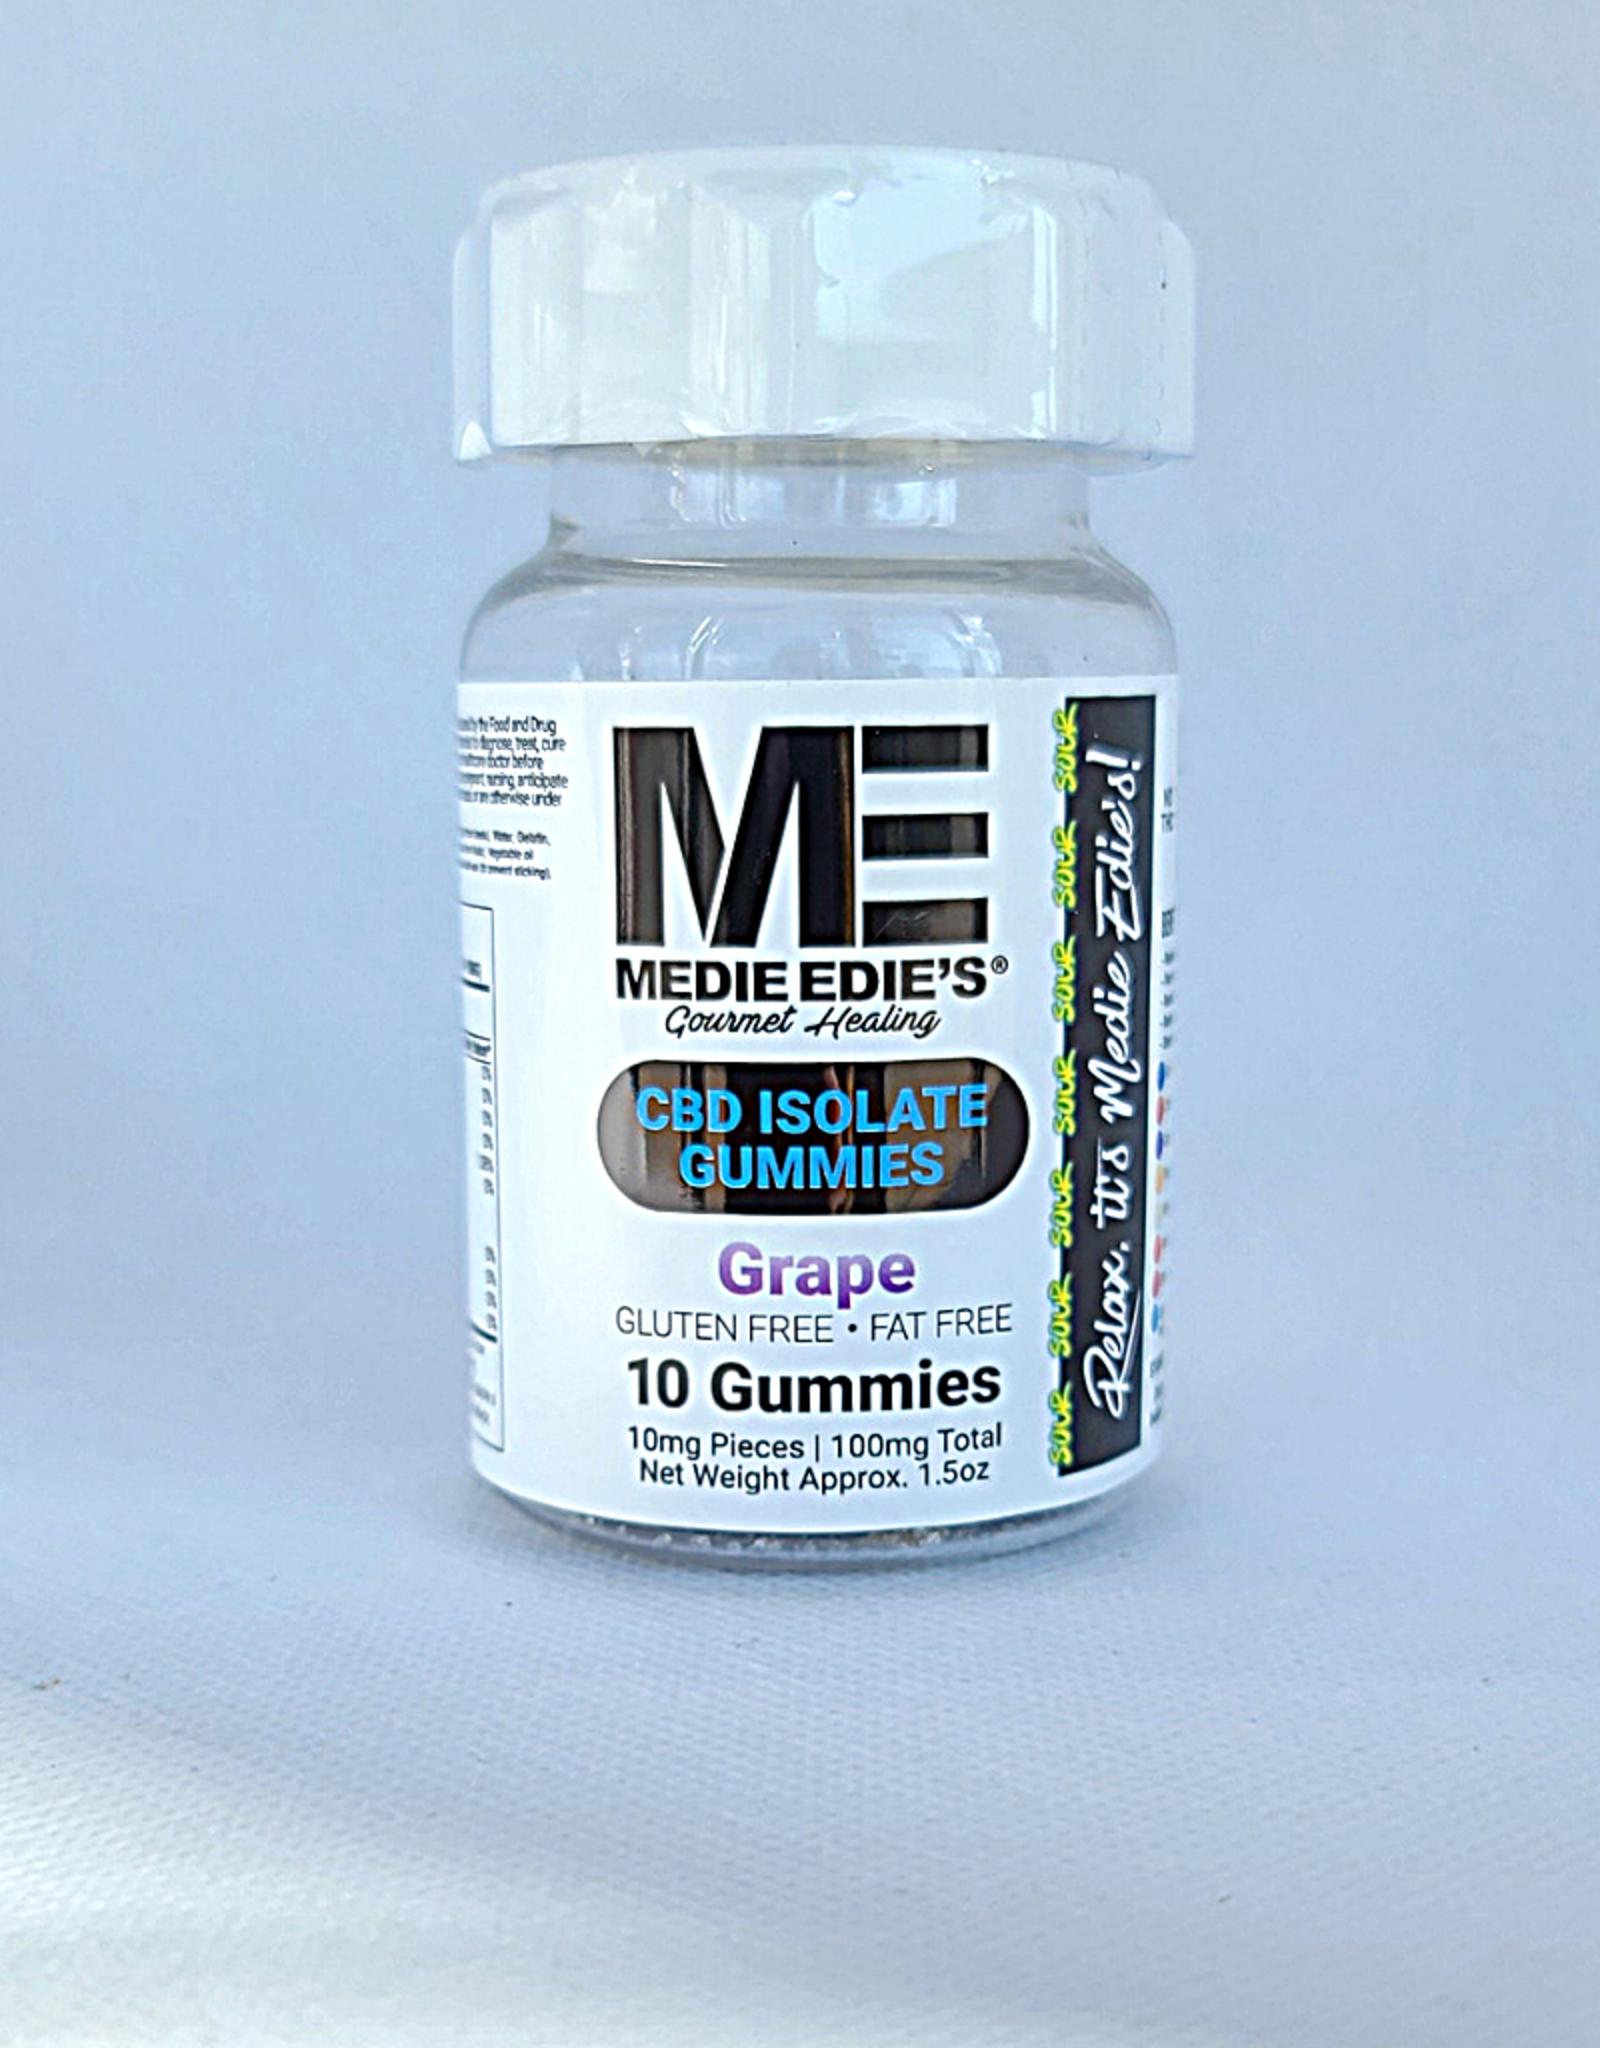 Medie Edie's Sour Grape CBD Gummies - 10ct/10mg/100mg